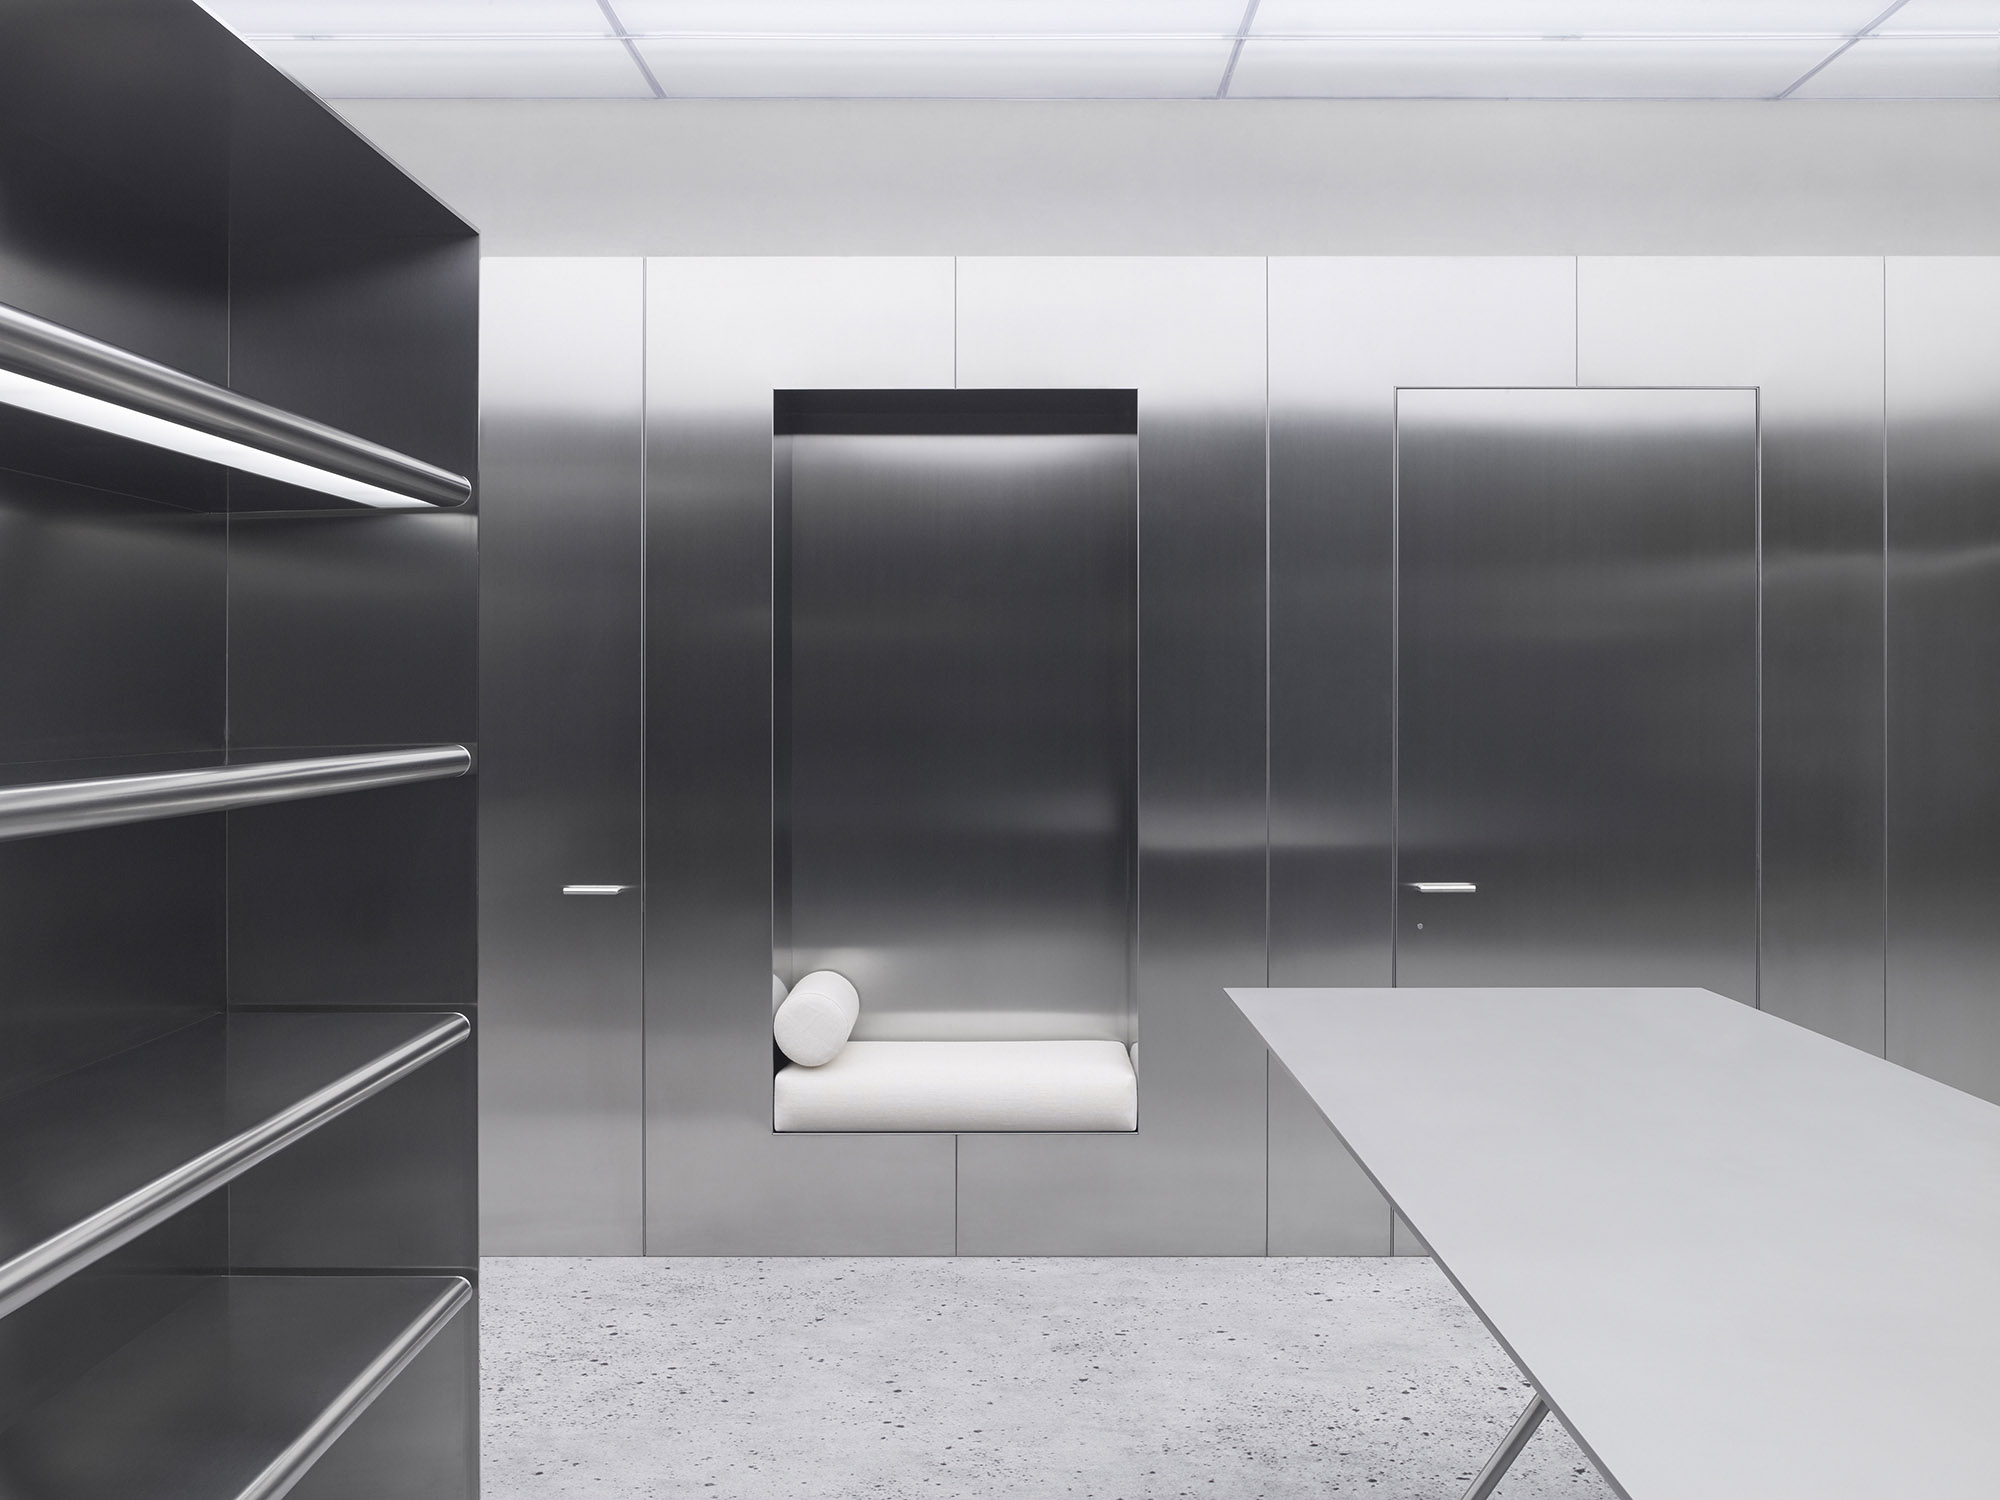 acne studios illum stergade 52 copenhagen christian haller d design. Black Bedroom Furniture Sets. Home Design Ideas